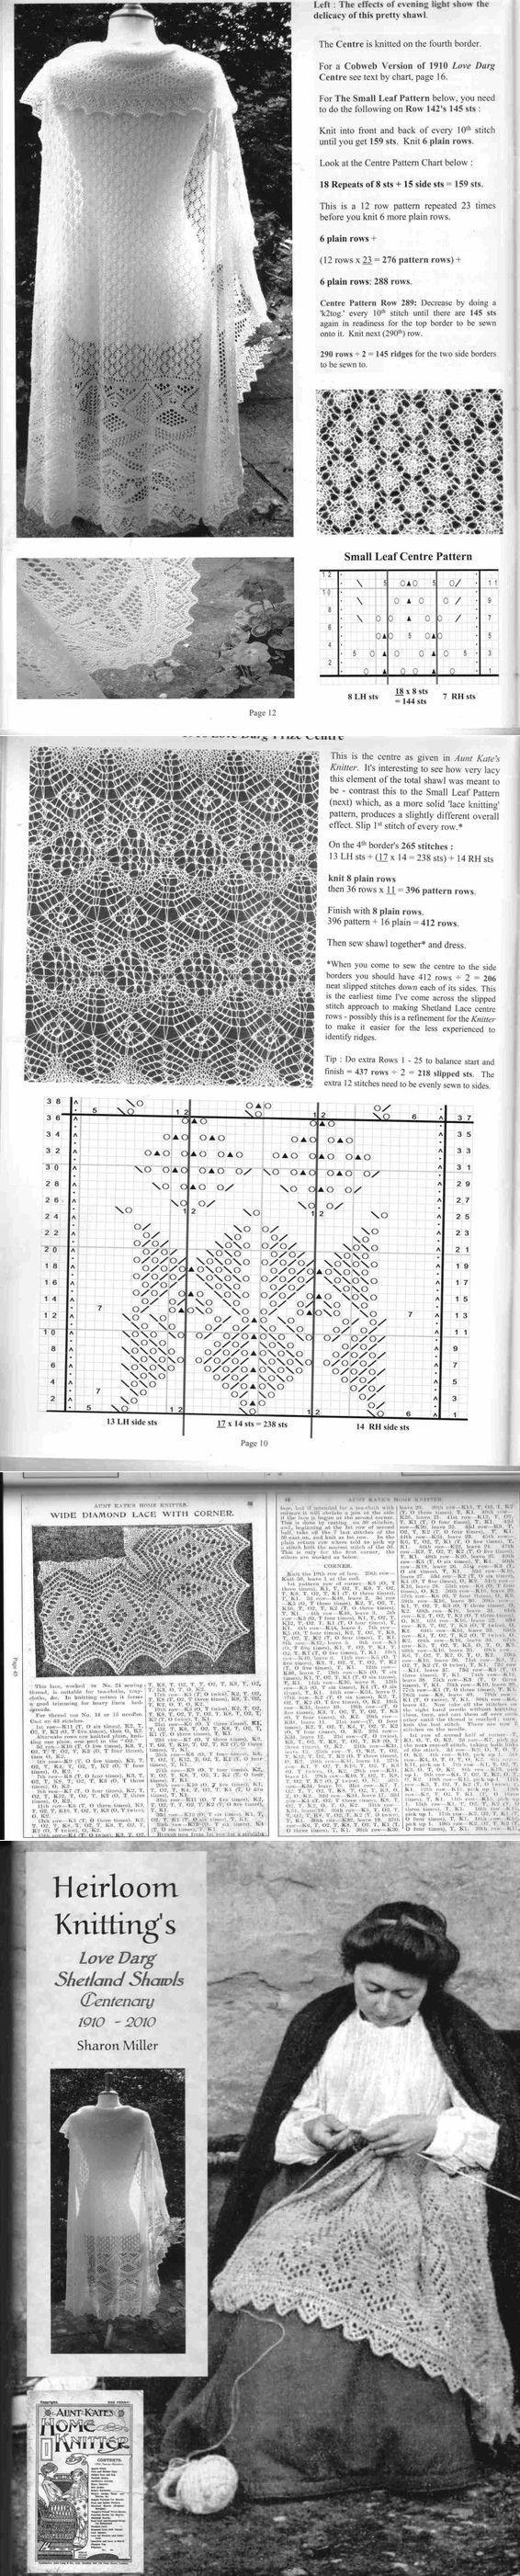 цитата Zinaida-k : Heirloom Knitting's Love Darg Shetland Shawls by Sharon Miller (14:58 21-05-2015) [3897121/362493793] - elena-50966@mail.ru - Почта Mail.Ru